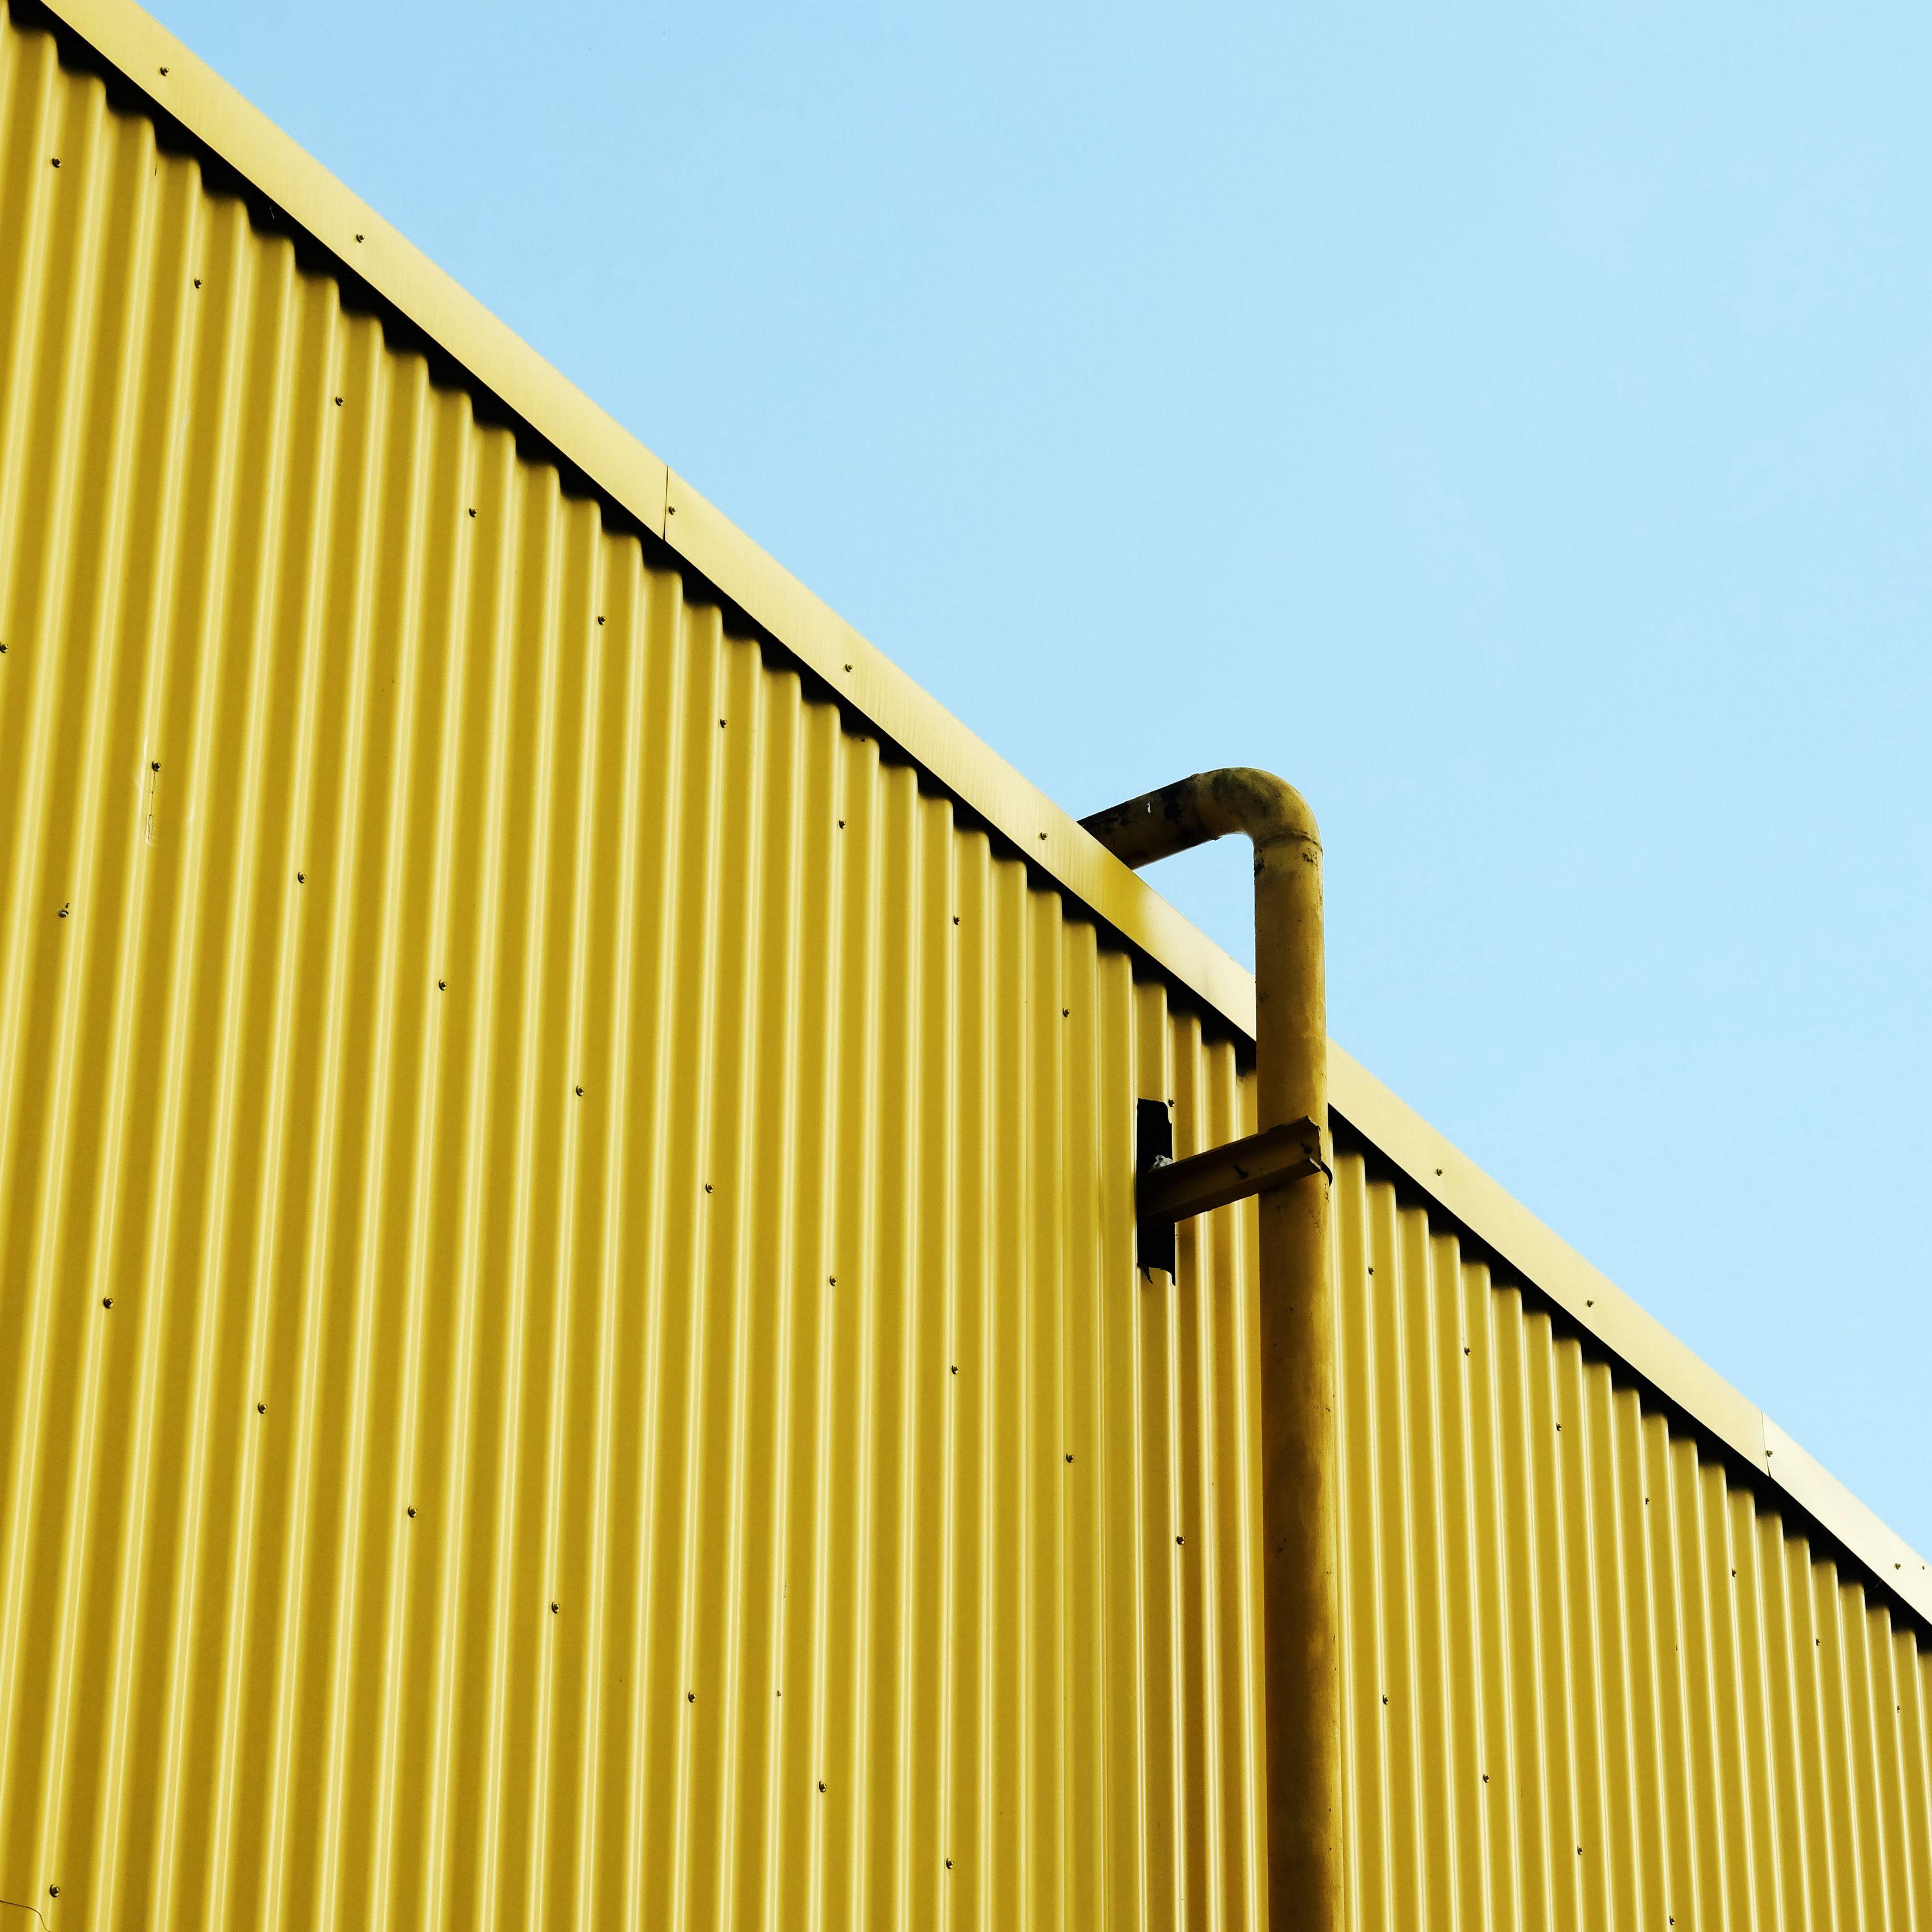 3415x3415 Wallpaper building, pipe, yellow, minimalism